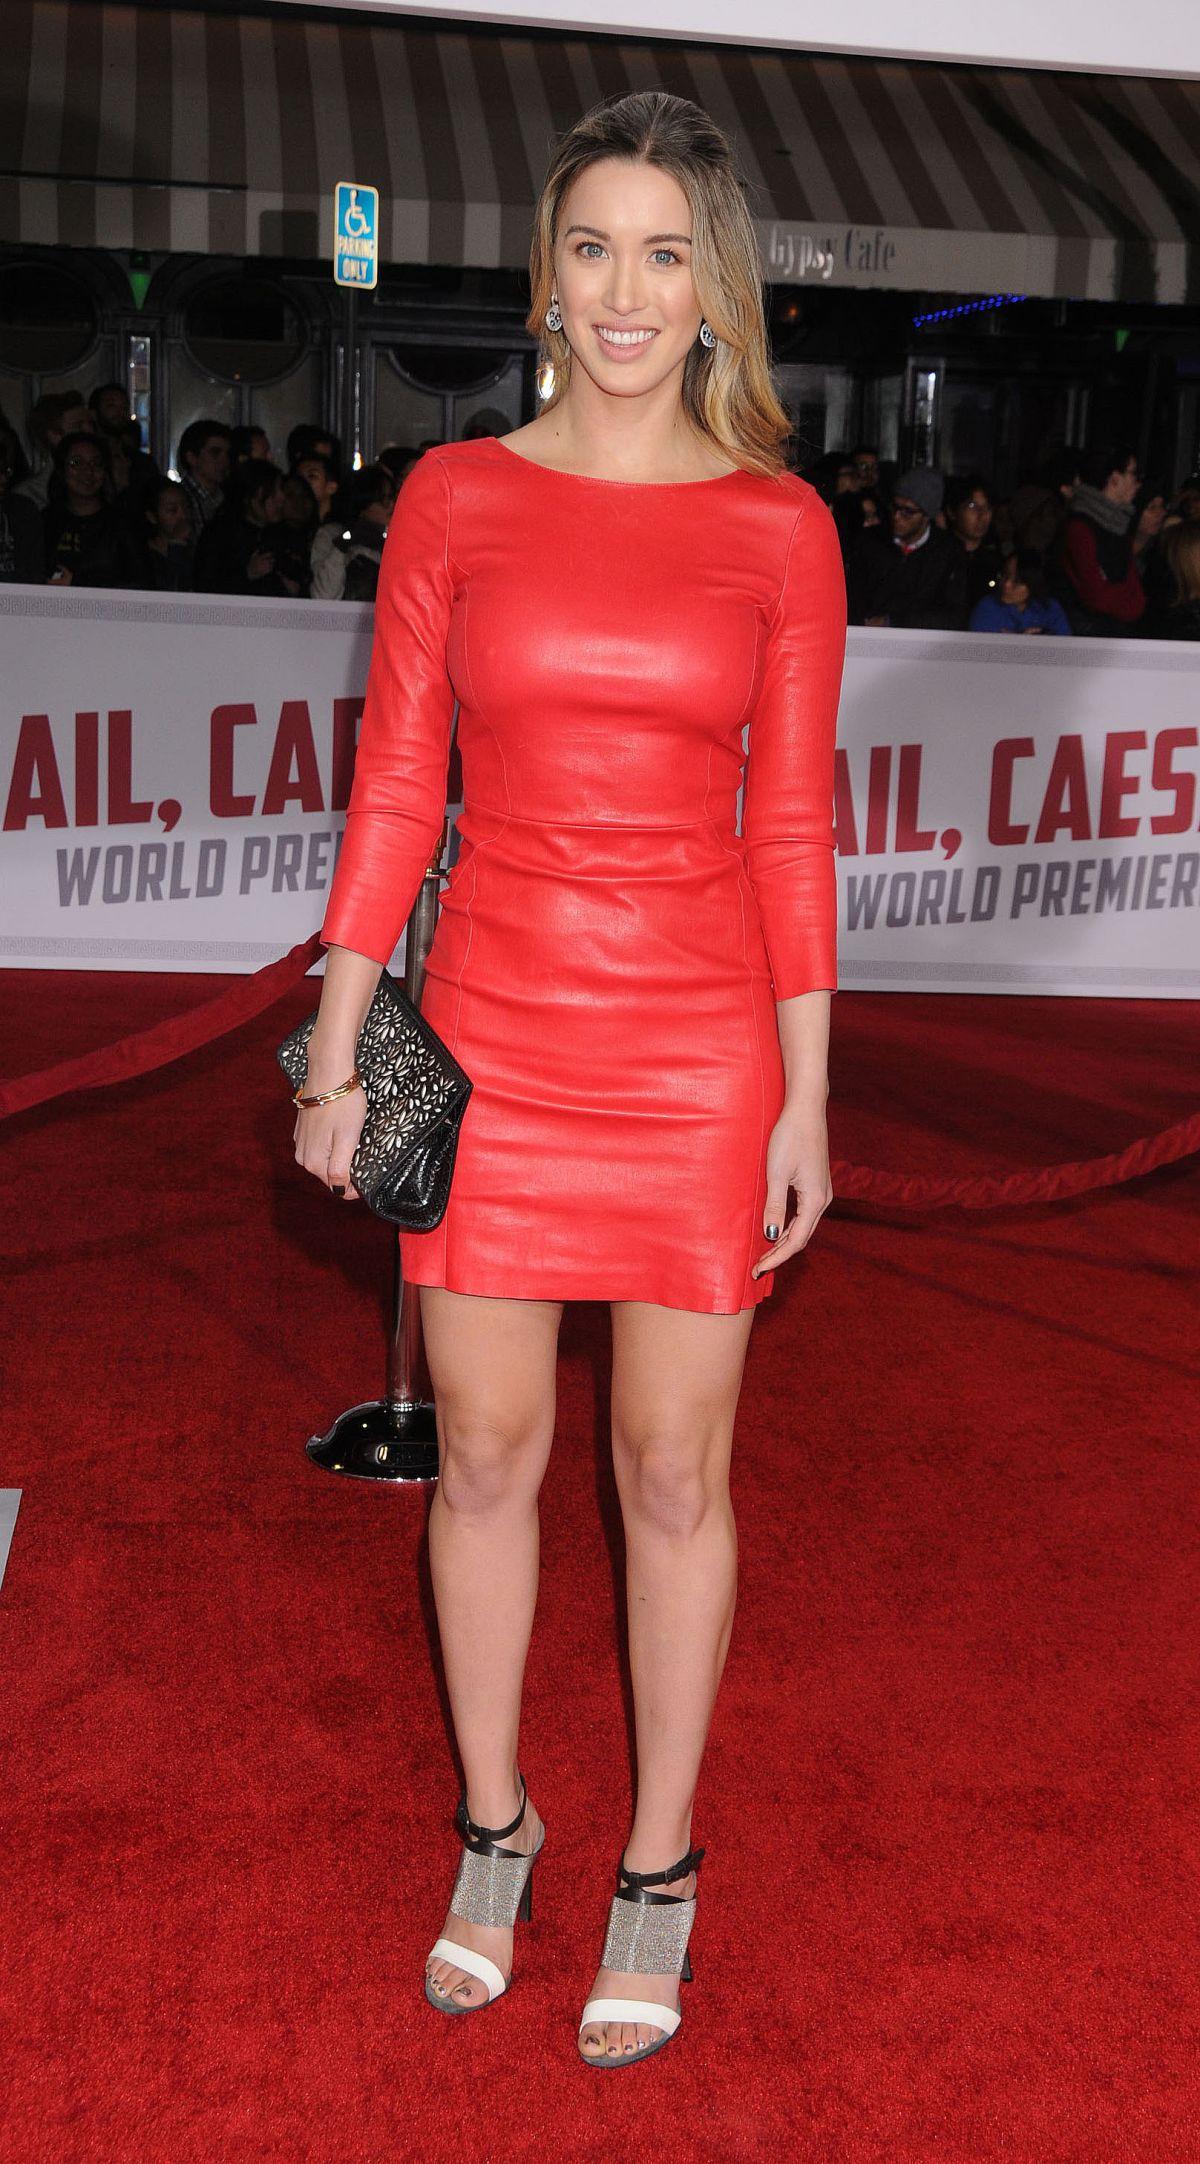 MELISSA BOLONA at Hail, Caesar Premiere in Westwood 02/01/2016